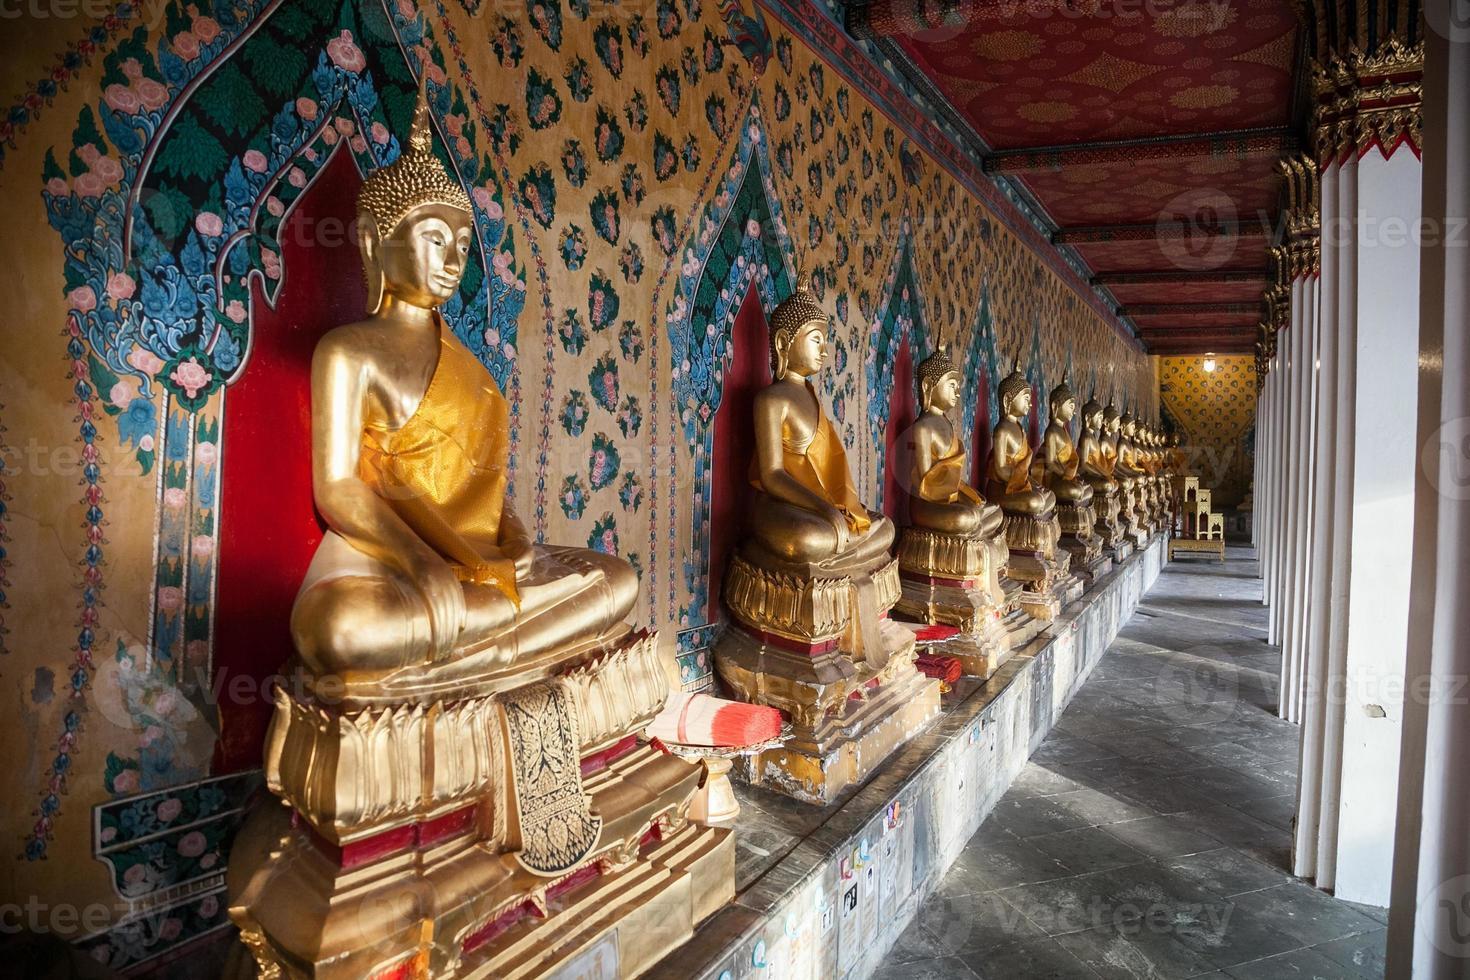 statue de Bouddha au cambodge photo